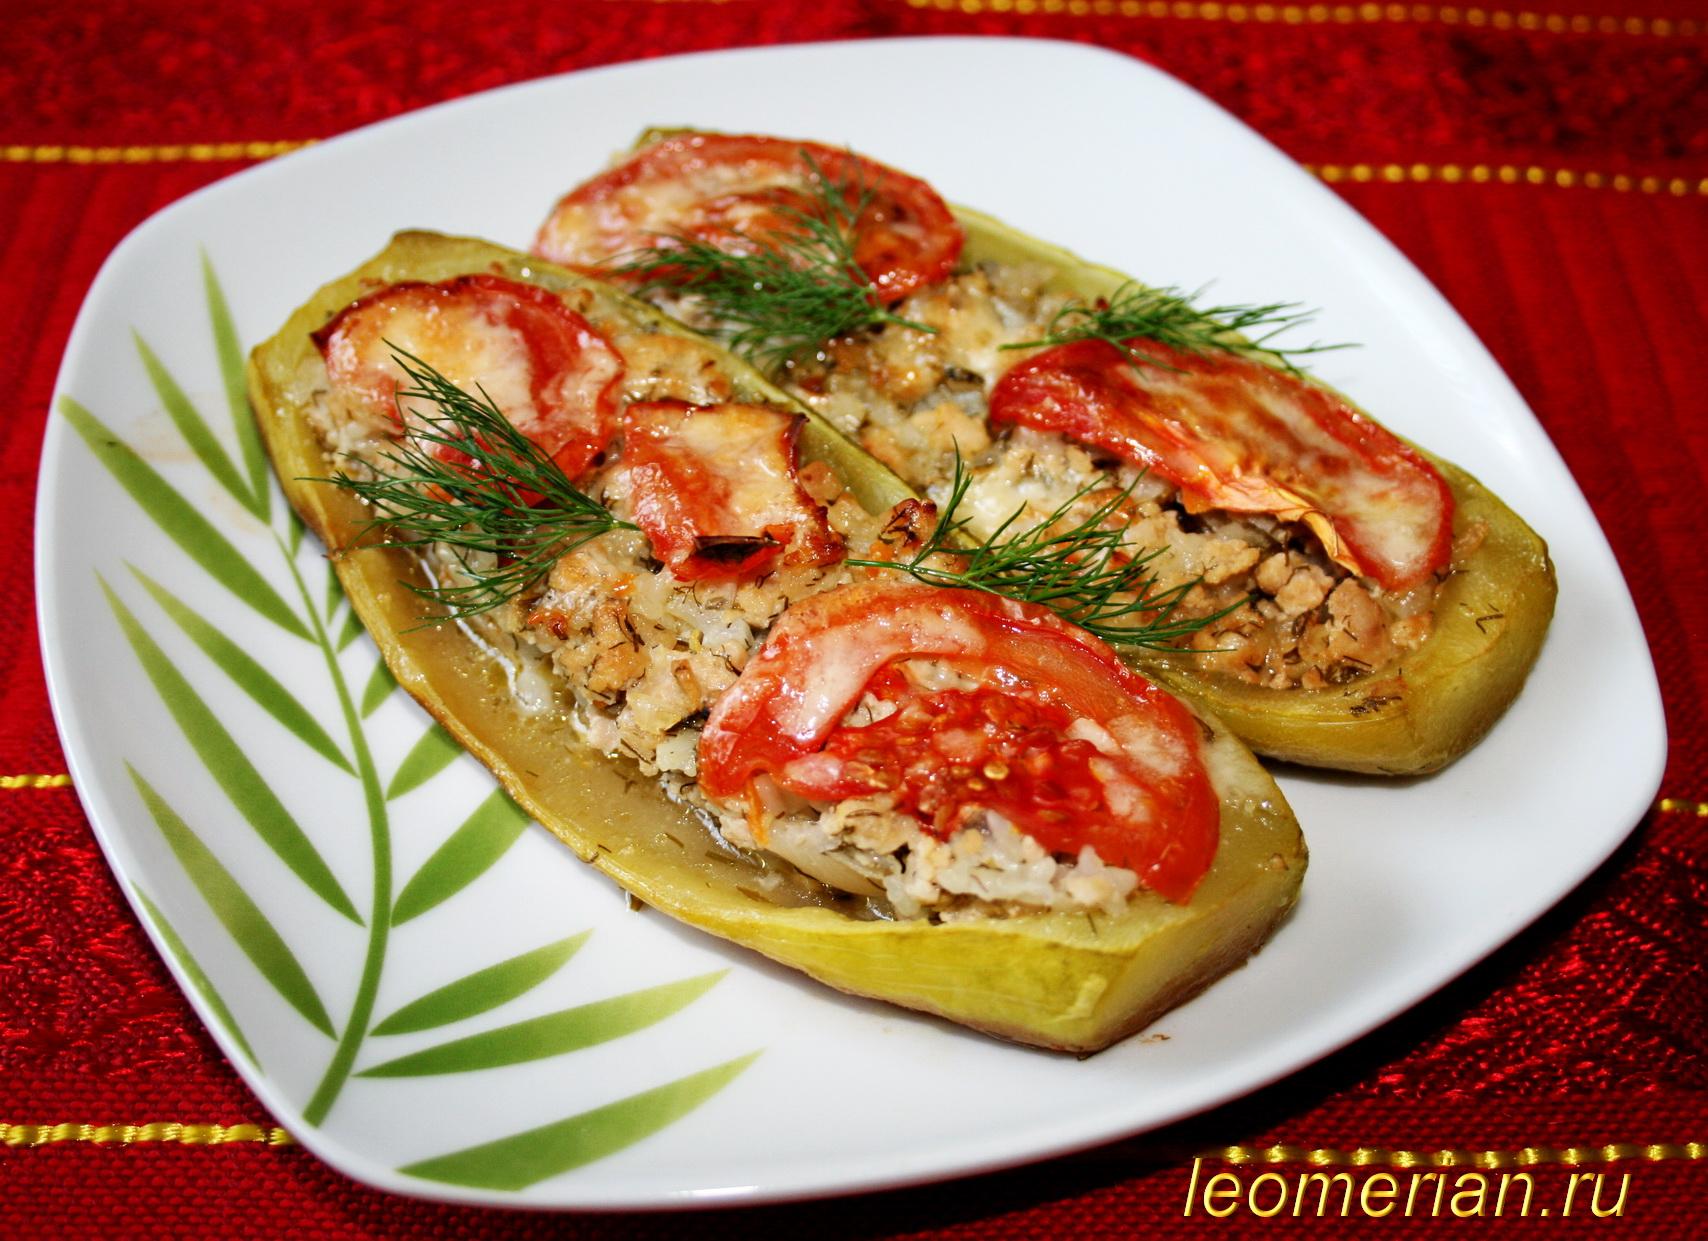 Кабачки фаршированные мясом и рисом рецепт пошагово